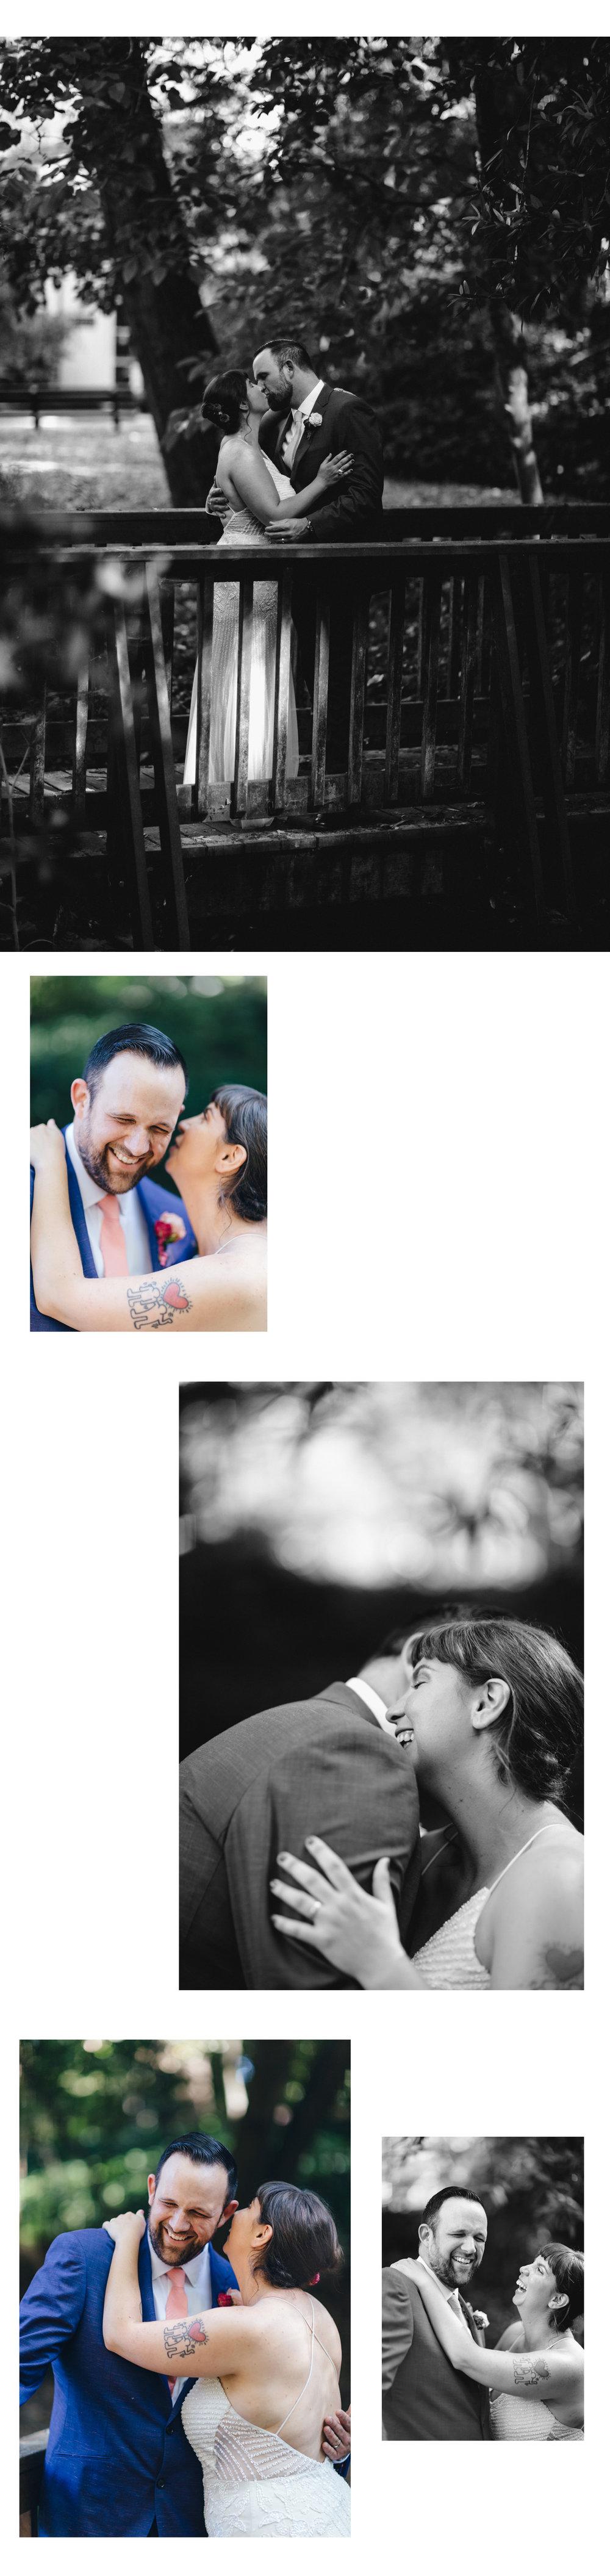 IG_wedding (41 of 110) copy.jpg